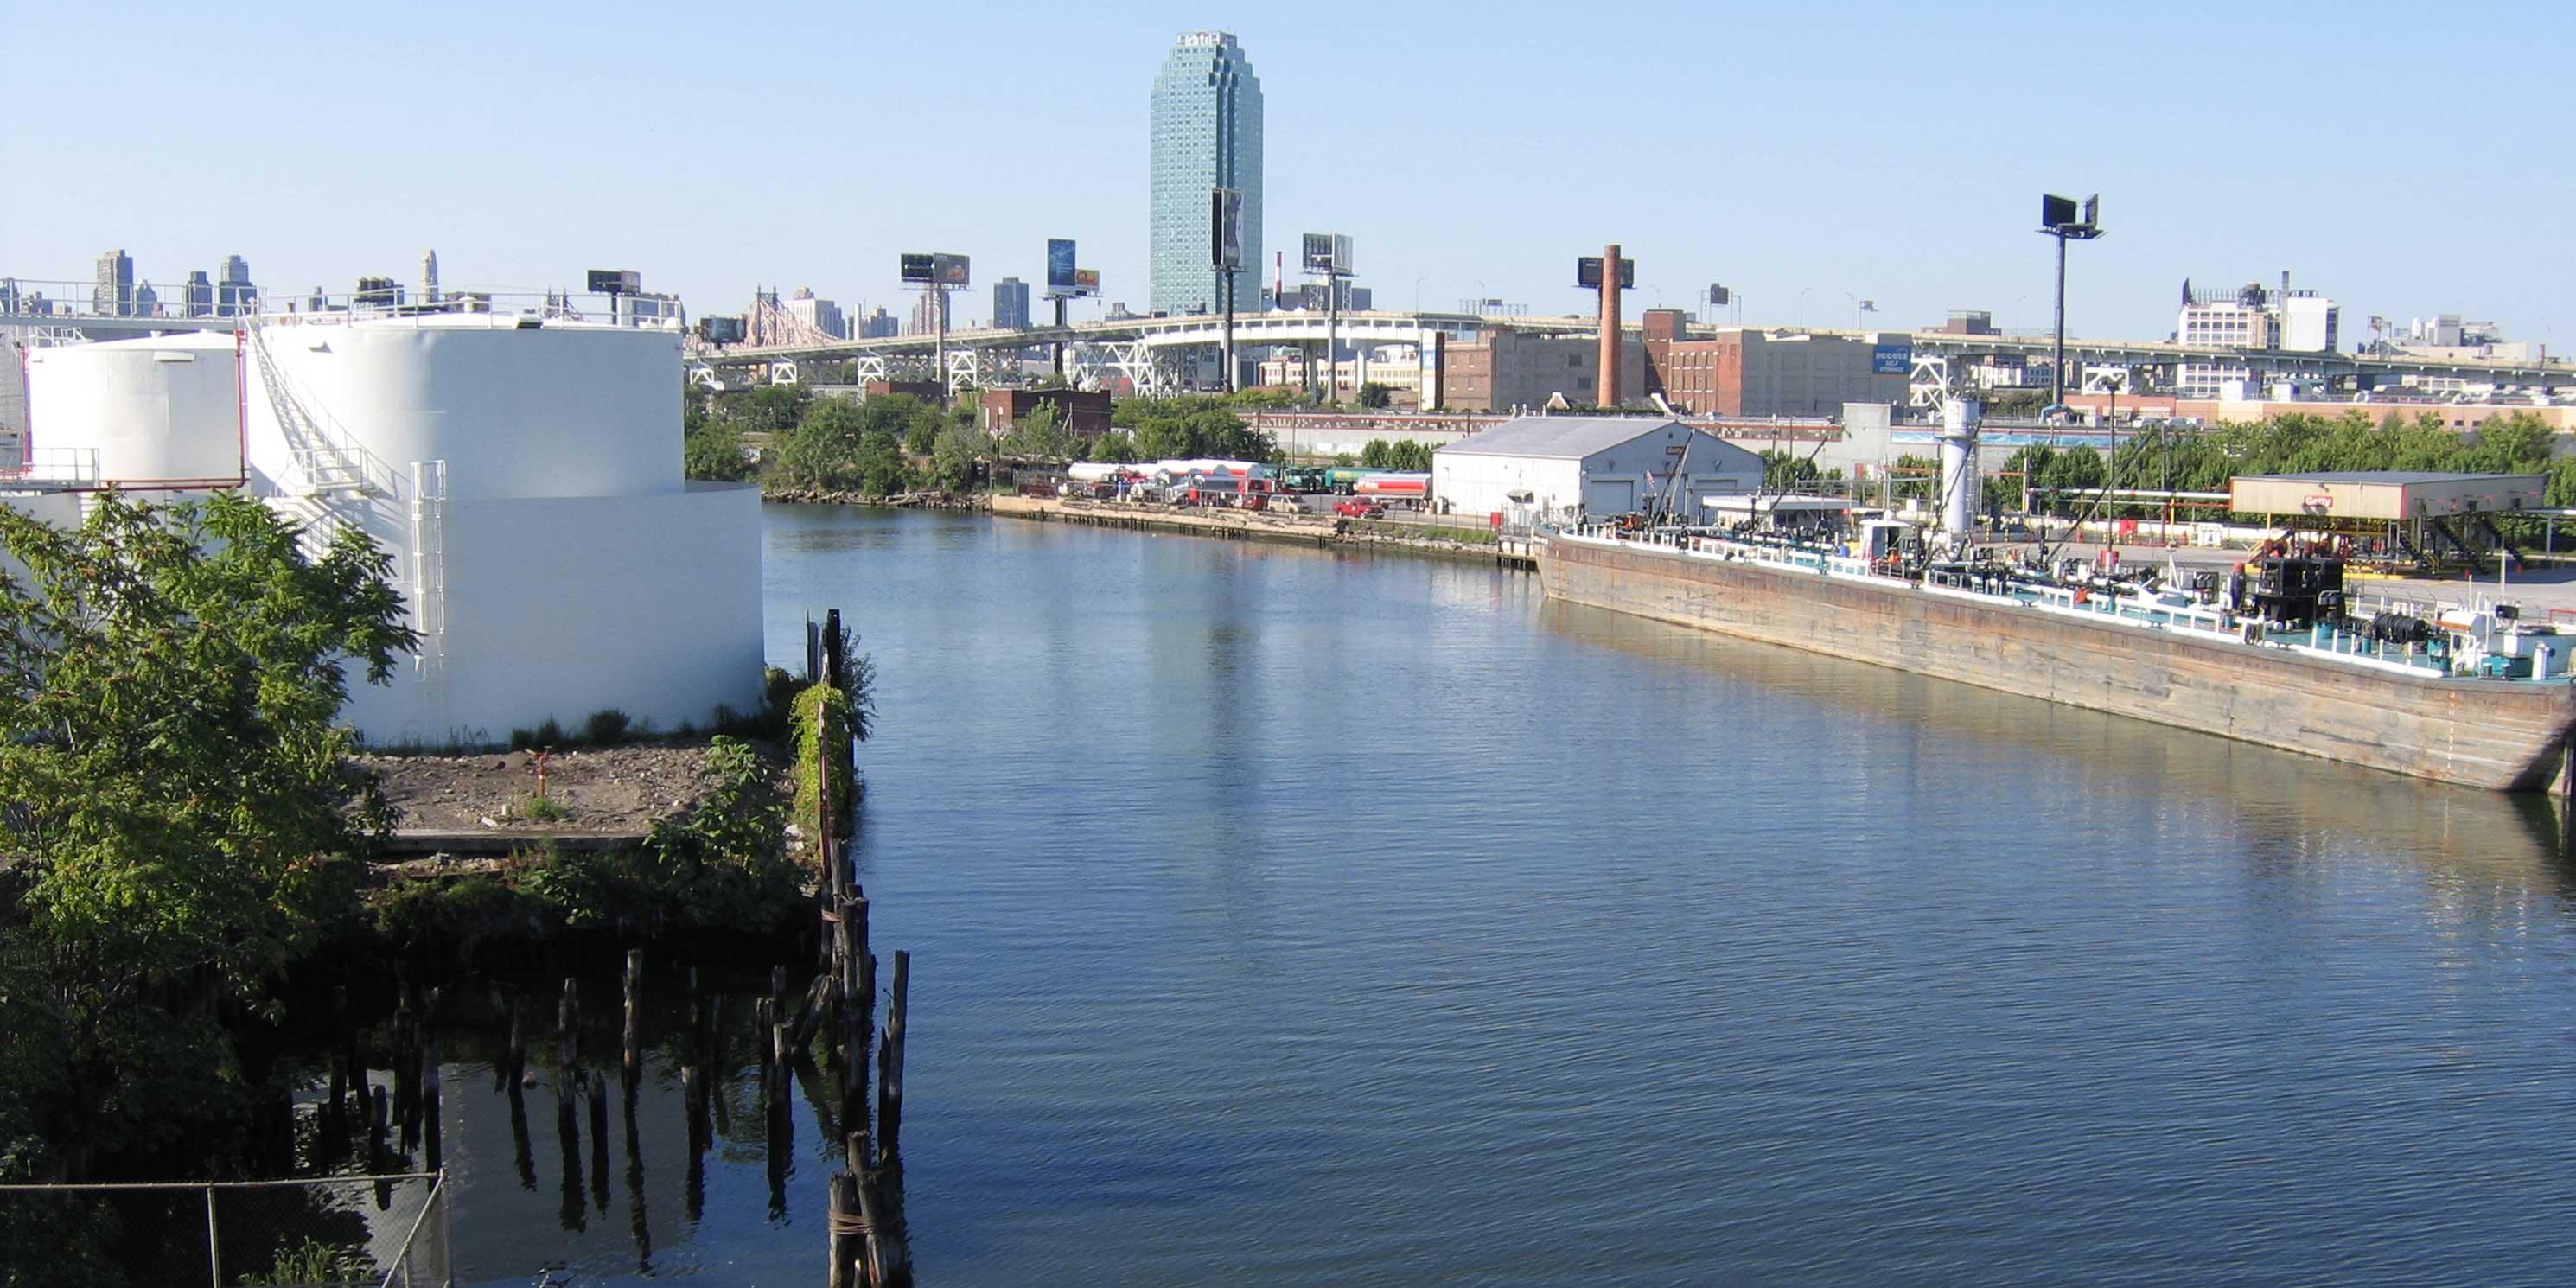 Newtown Creek as seen from the Greenpoint Avenue Bridge